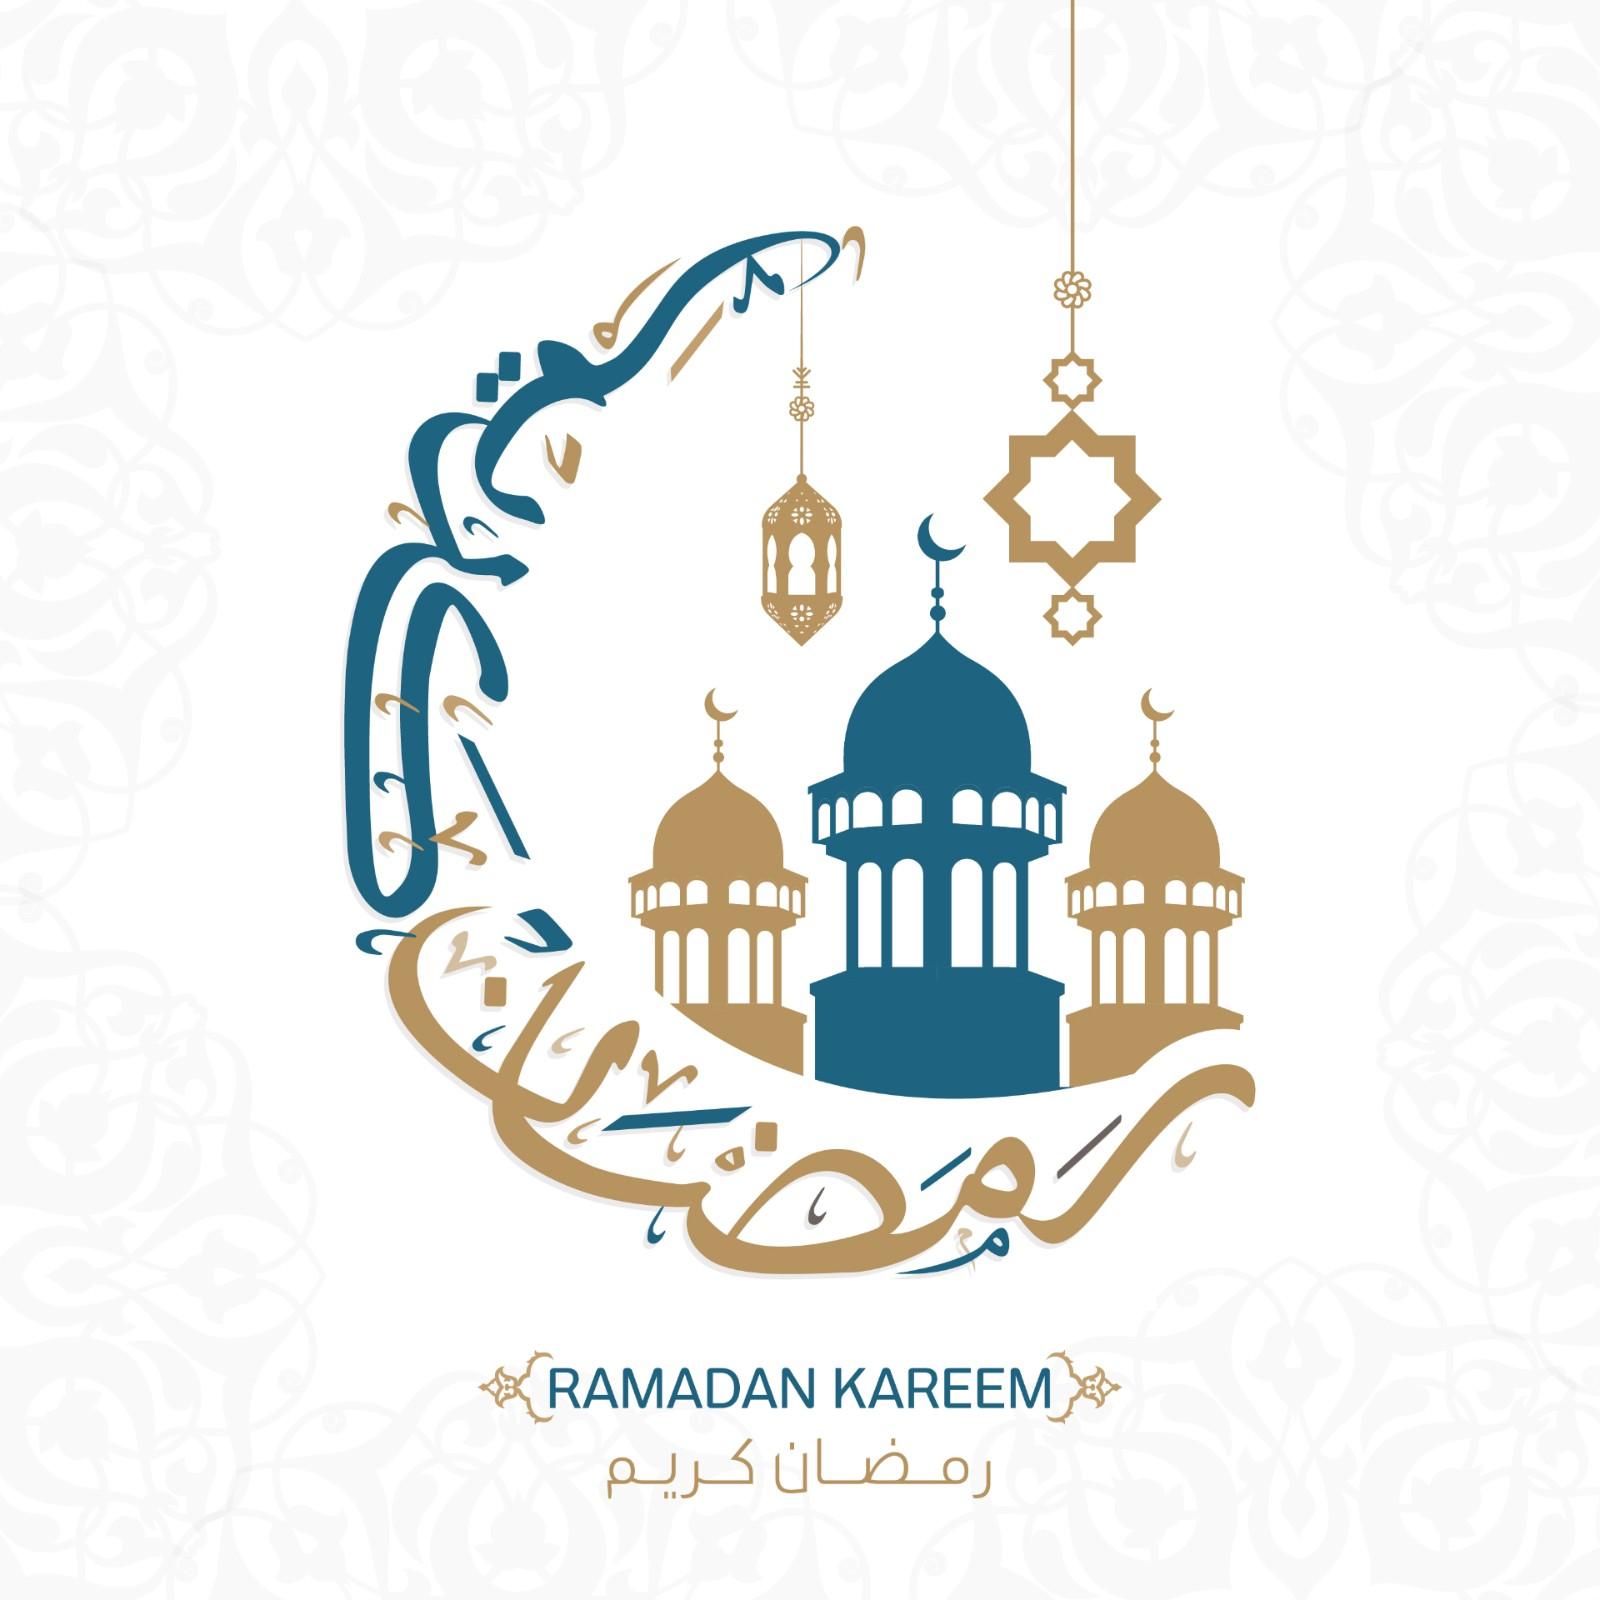 تحميل إمساكية رمضان 2021 هولندا روتردام Pdf كتب Pdf مجانا